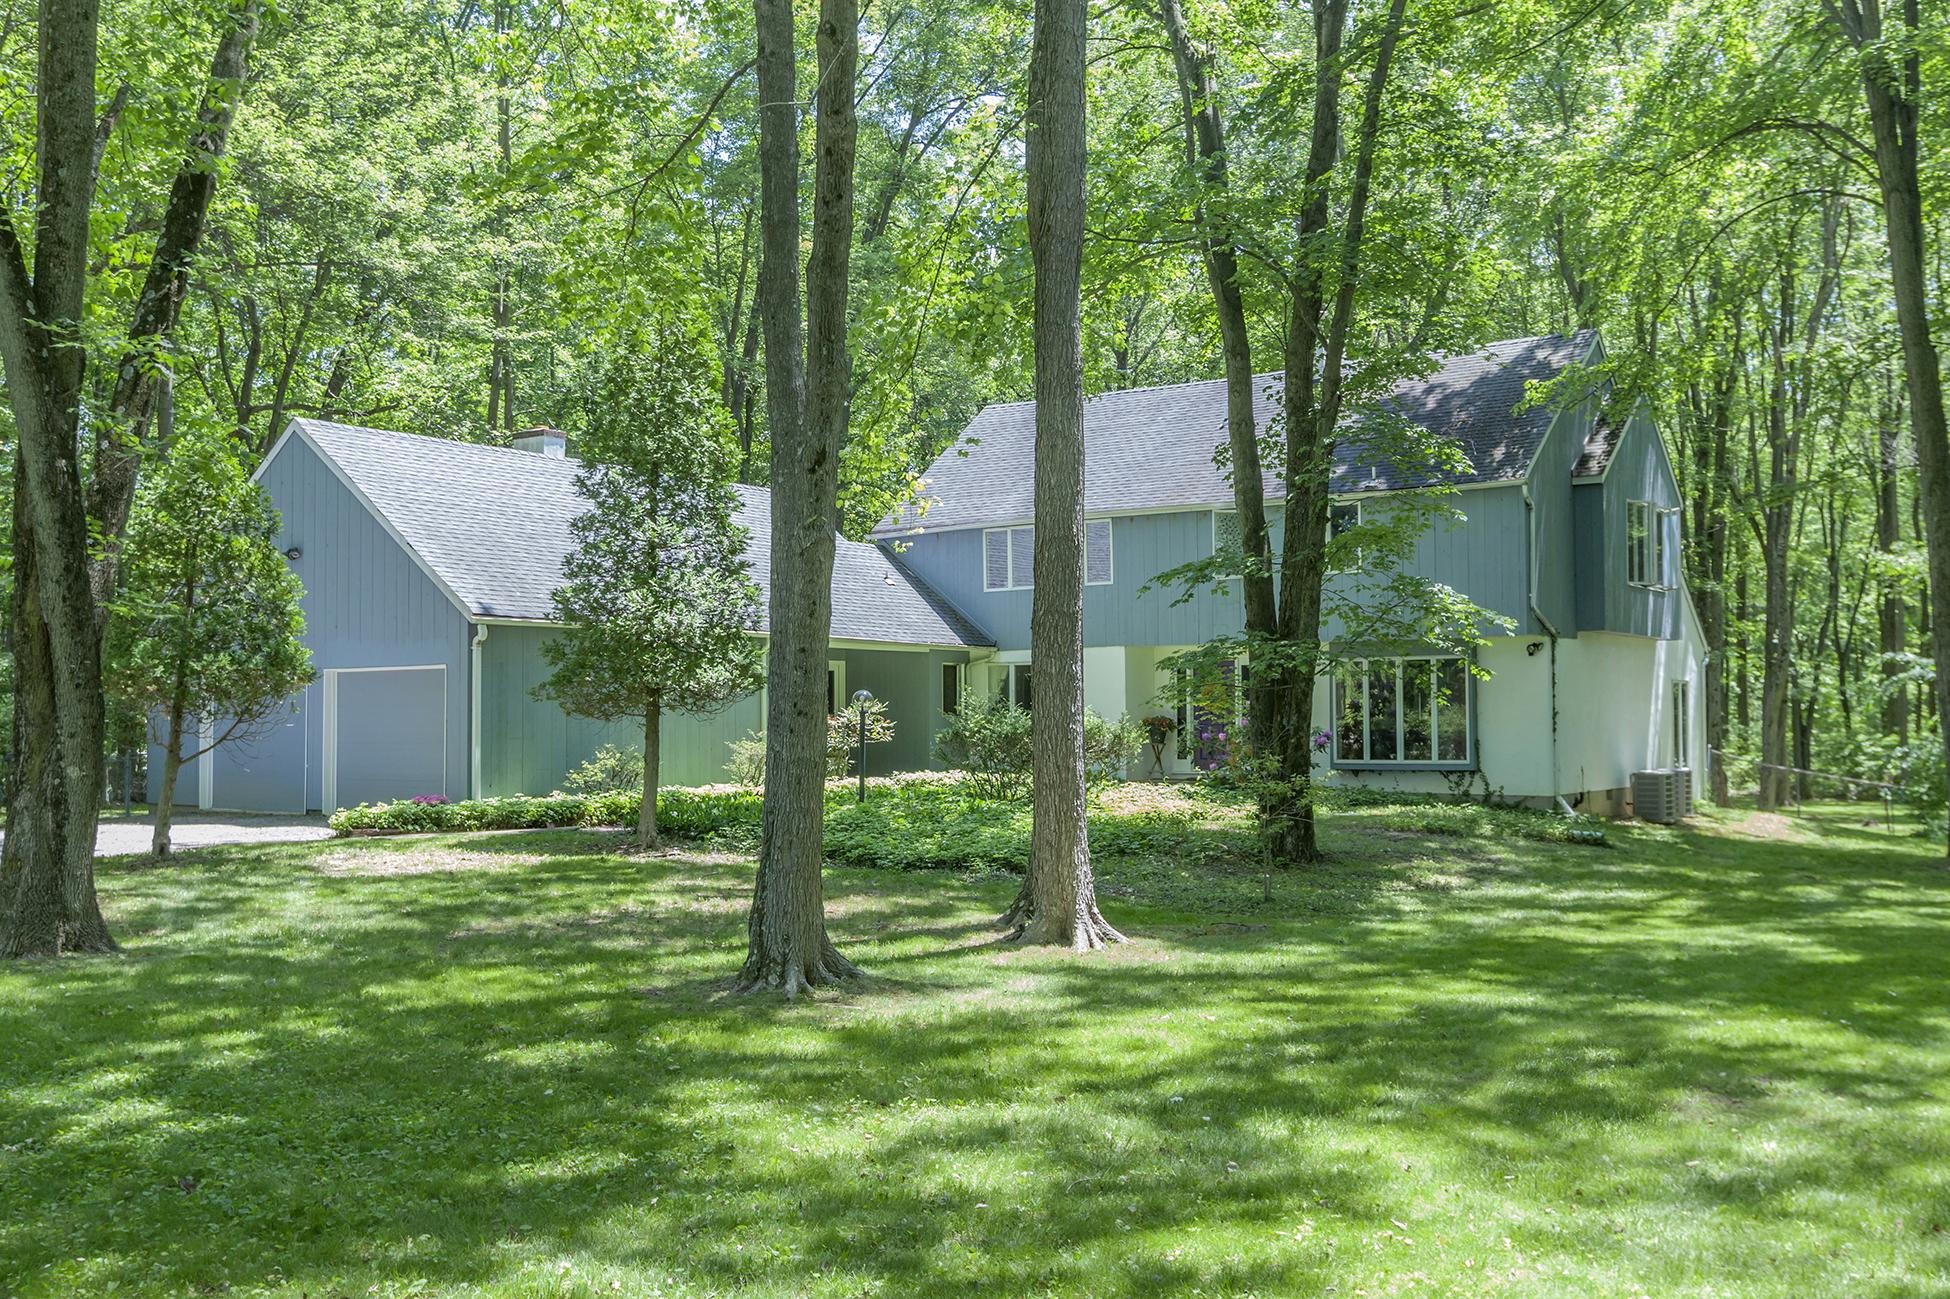 Moradia para Venda às A Nature Lover's Retreat, Hugged by Trees - Lawrence Township 19 Carson Road Princeton, Nova Jersey 08540 Estados Unidos